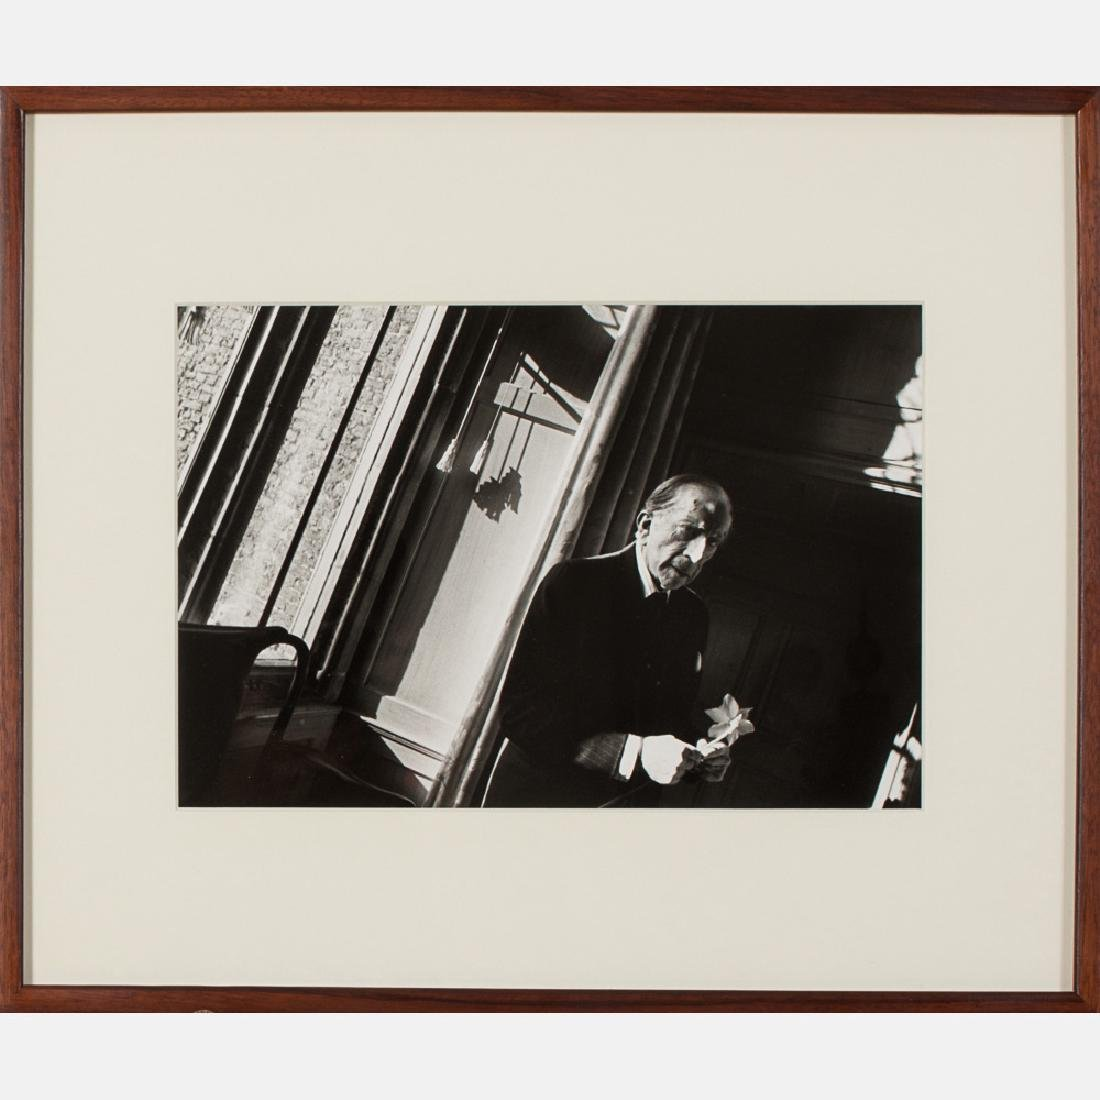 Harry Benson (b. 1929) J.P. Getty, 1974, Silver gelatin